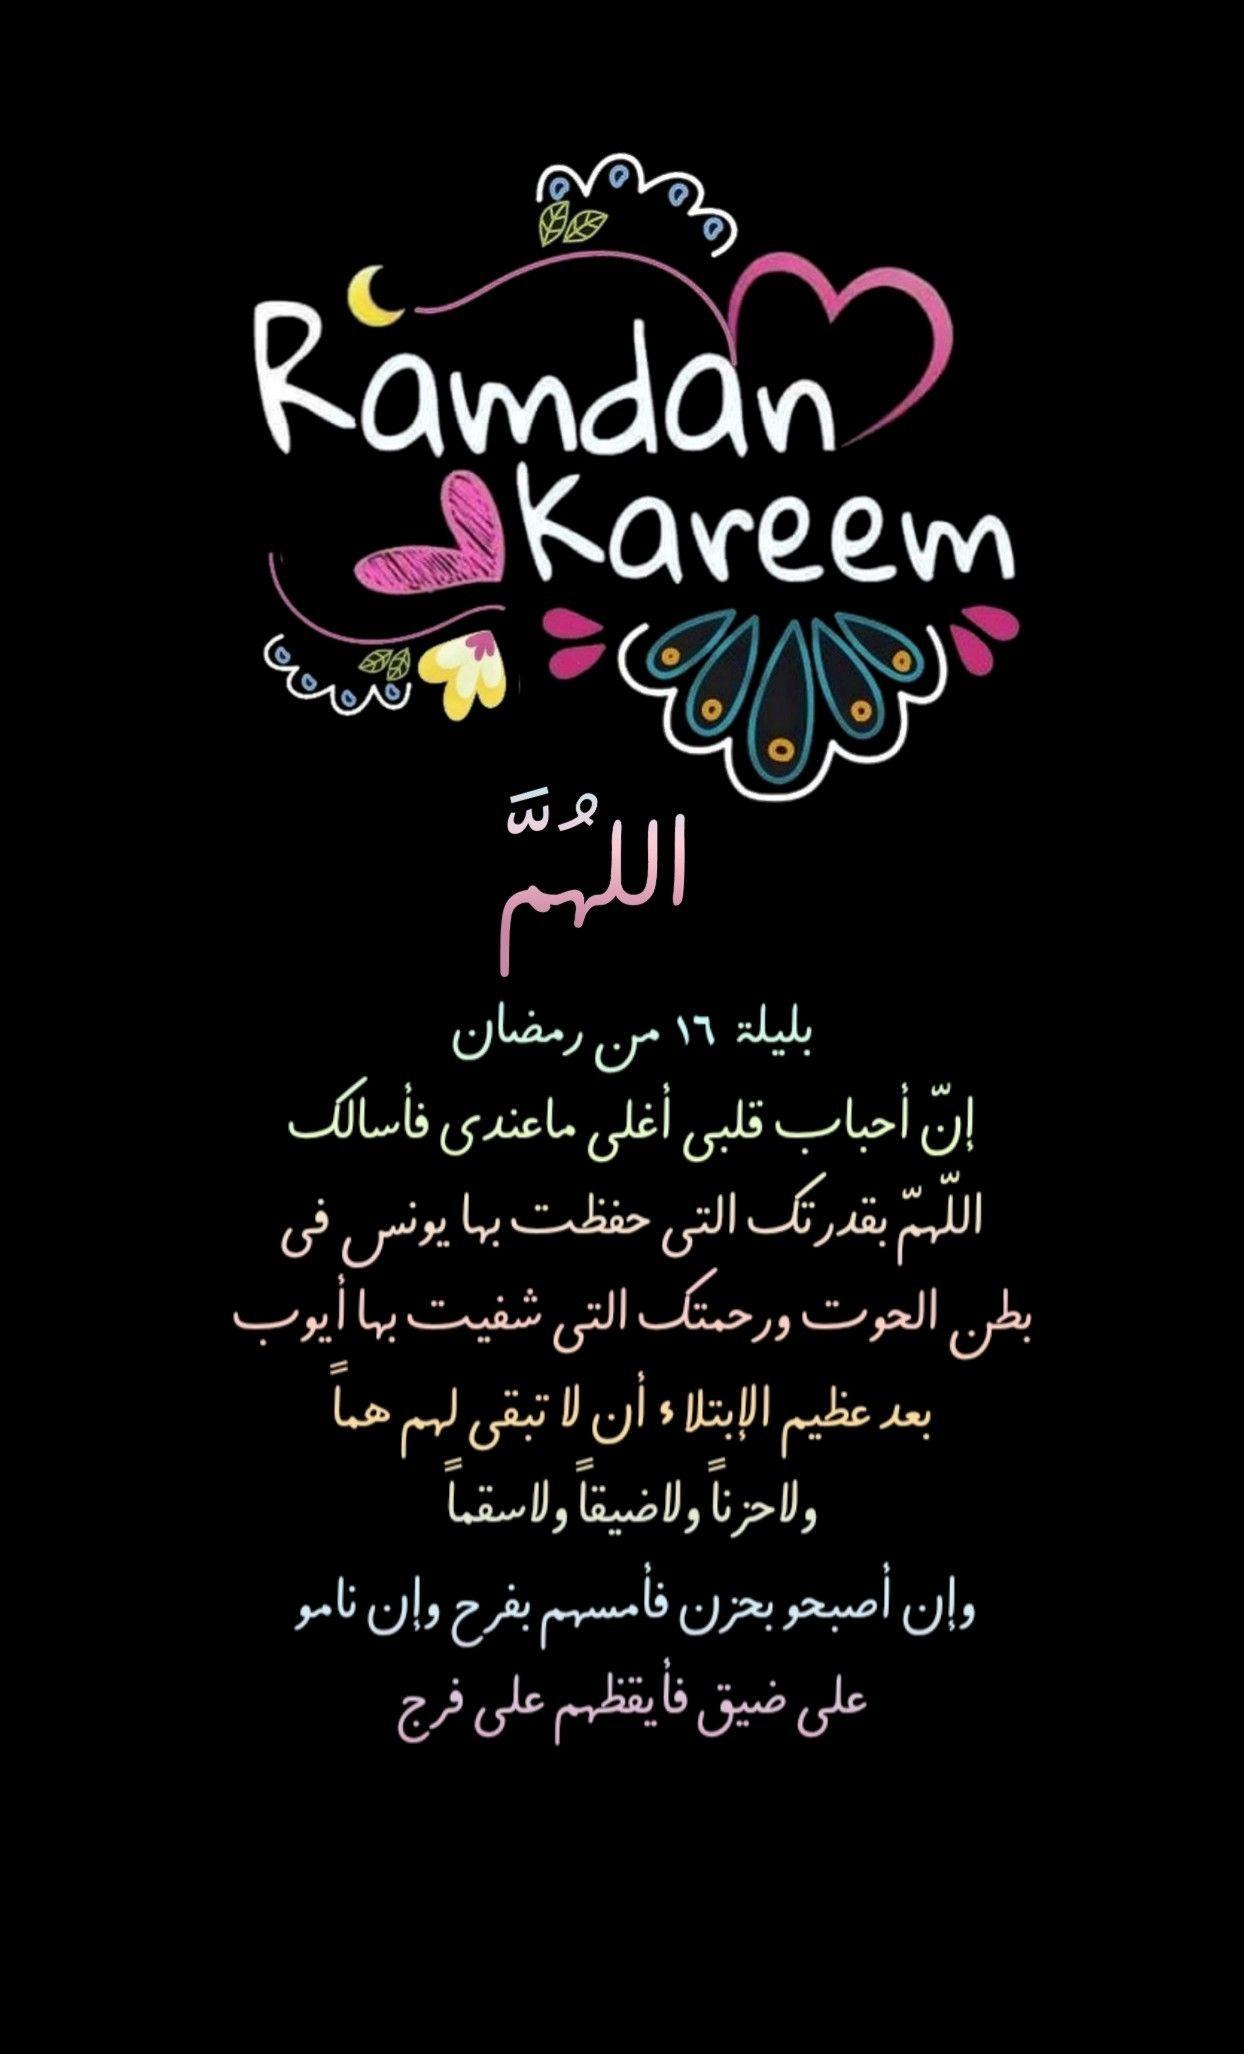 Pin By Alig On Ramadan Ramadan Quotes Ramadan Wishes Ramzan Mubarak Image